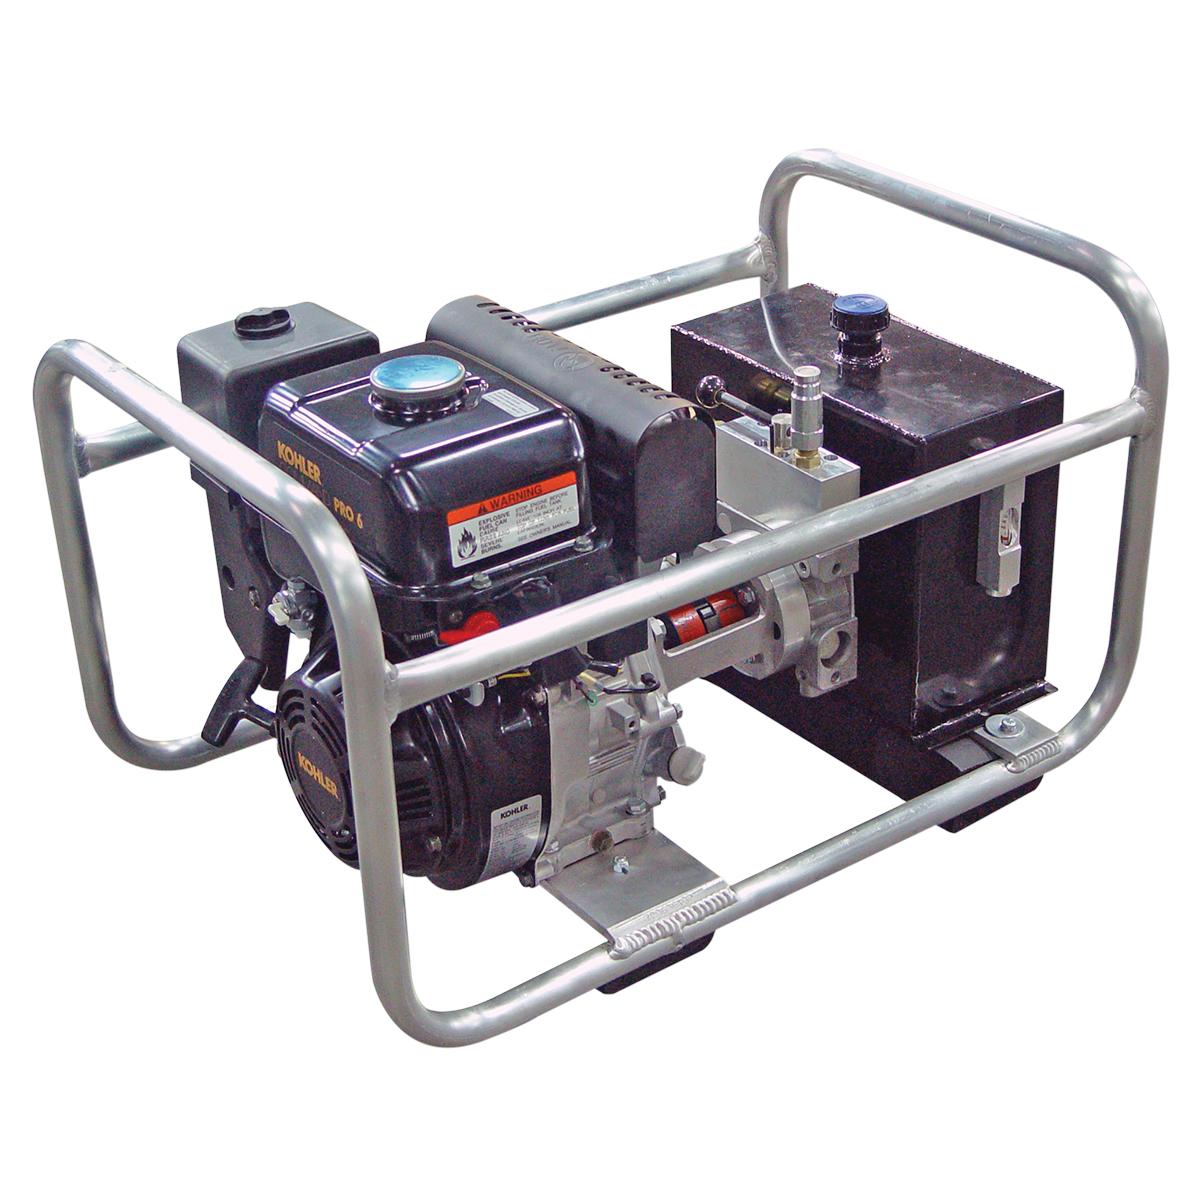 MULTI-PURPOSE HYDRAULIC DRIVE - Hydraulic power unit